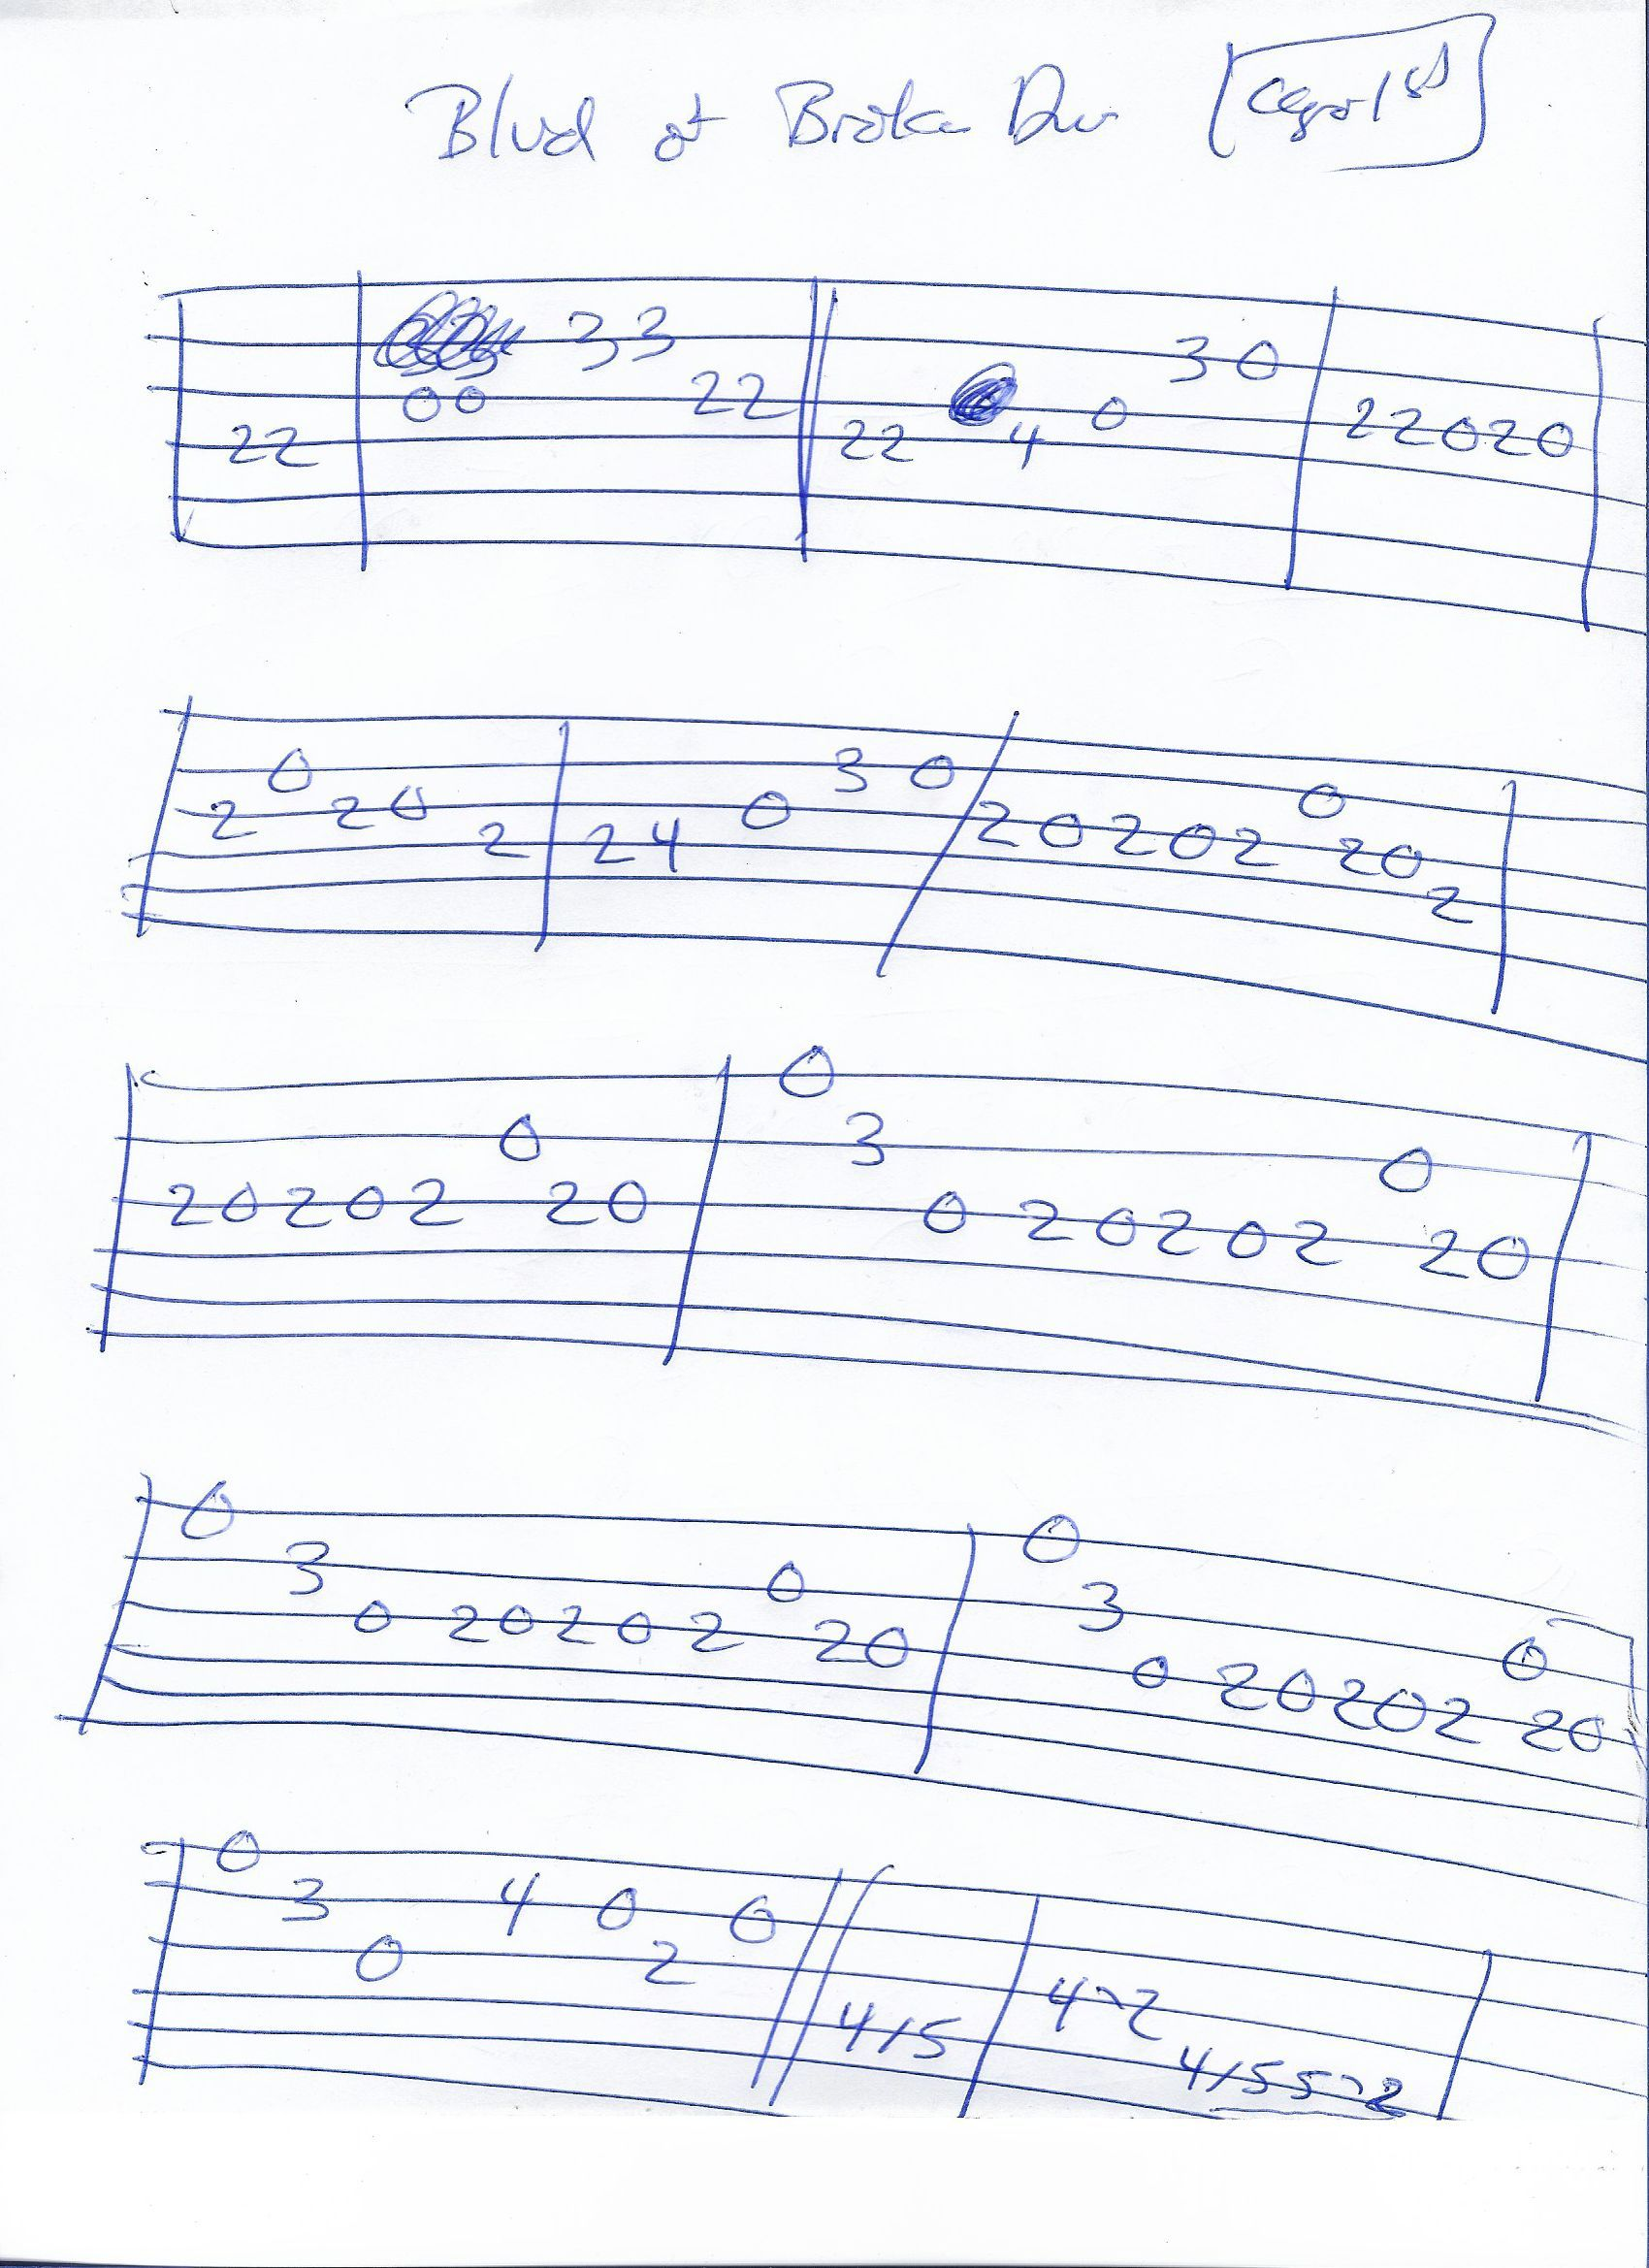 Blvd Of Broken Dreams Green Day Melody Guitar Tab Capo 1st Fret Guitar Tabs Guitar Tabs Songs Guitar Tabs And Chords